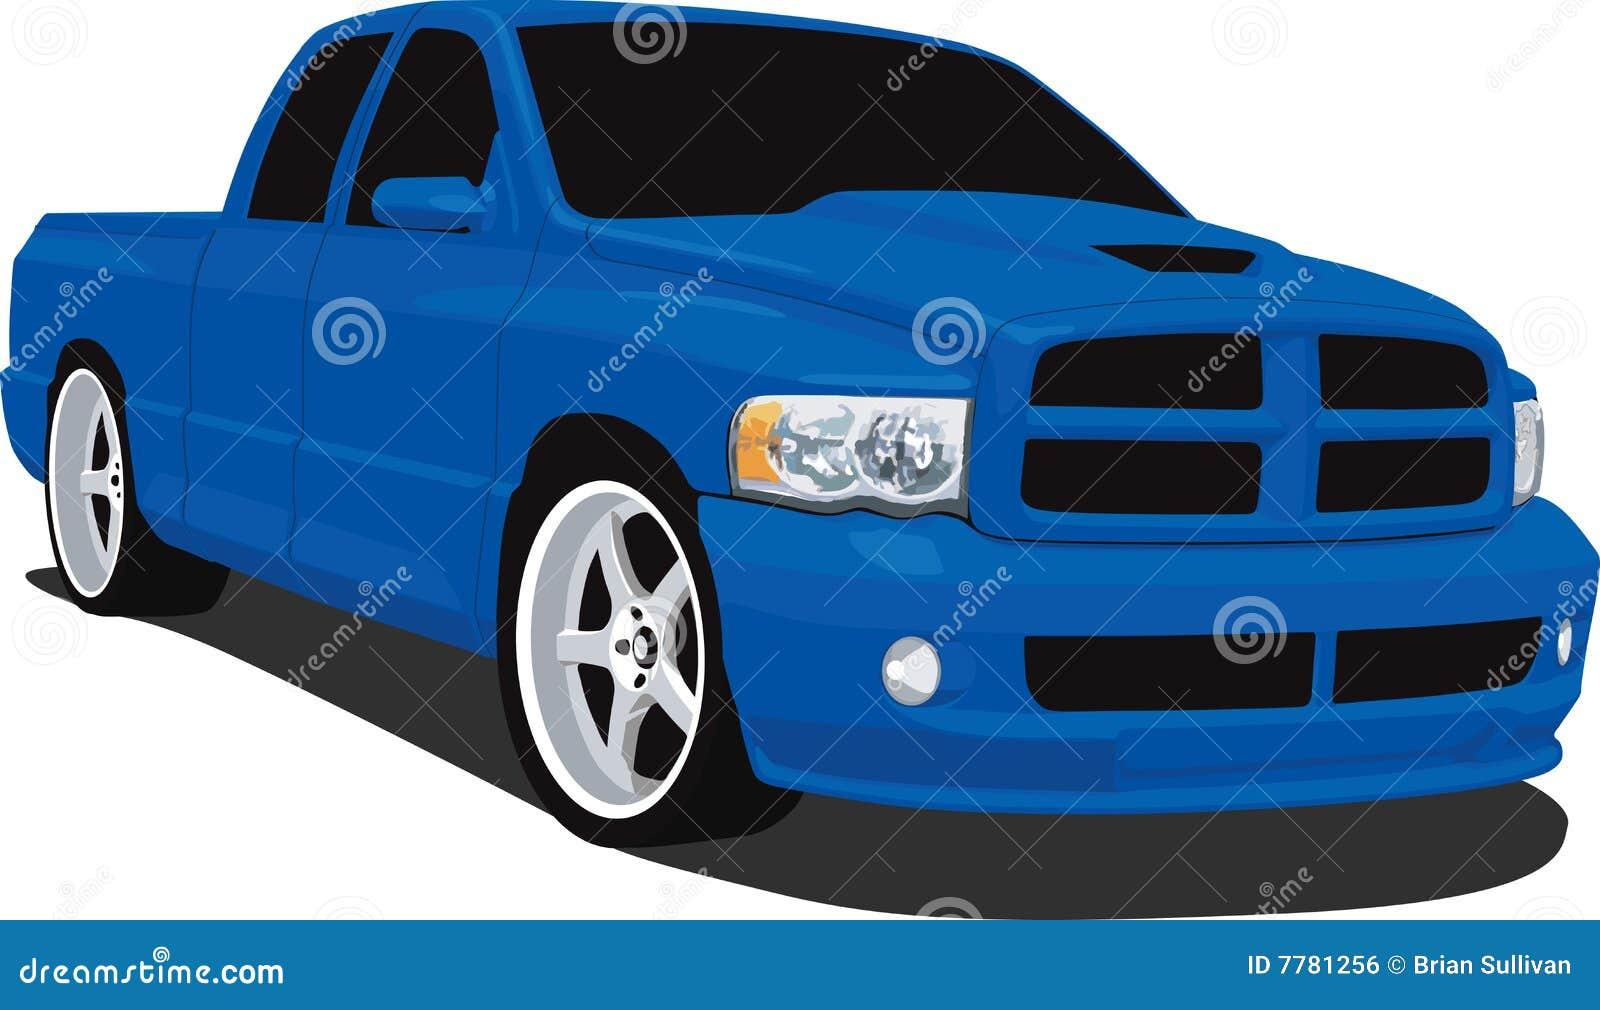 Dodge ram pick up truck royalty free stock image